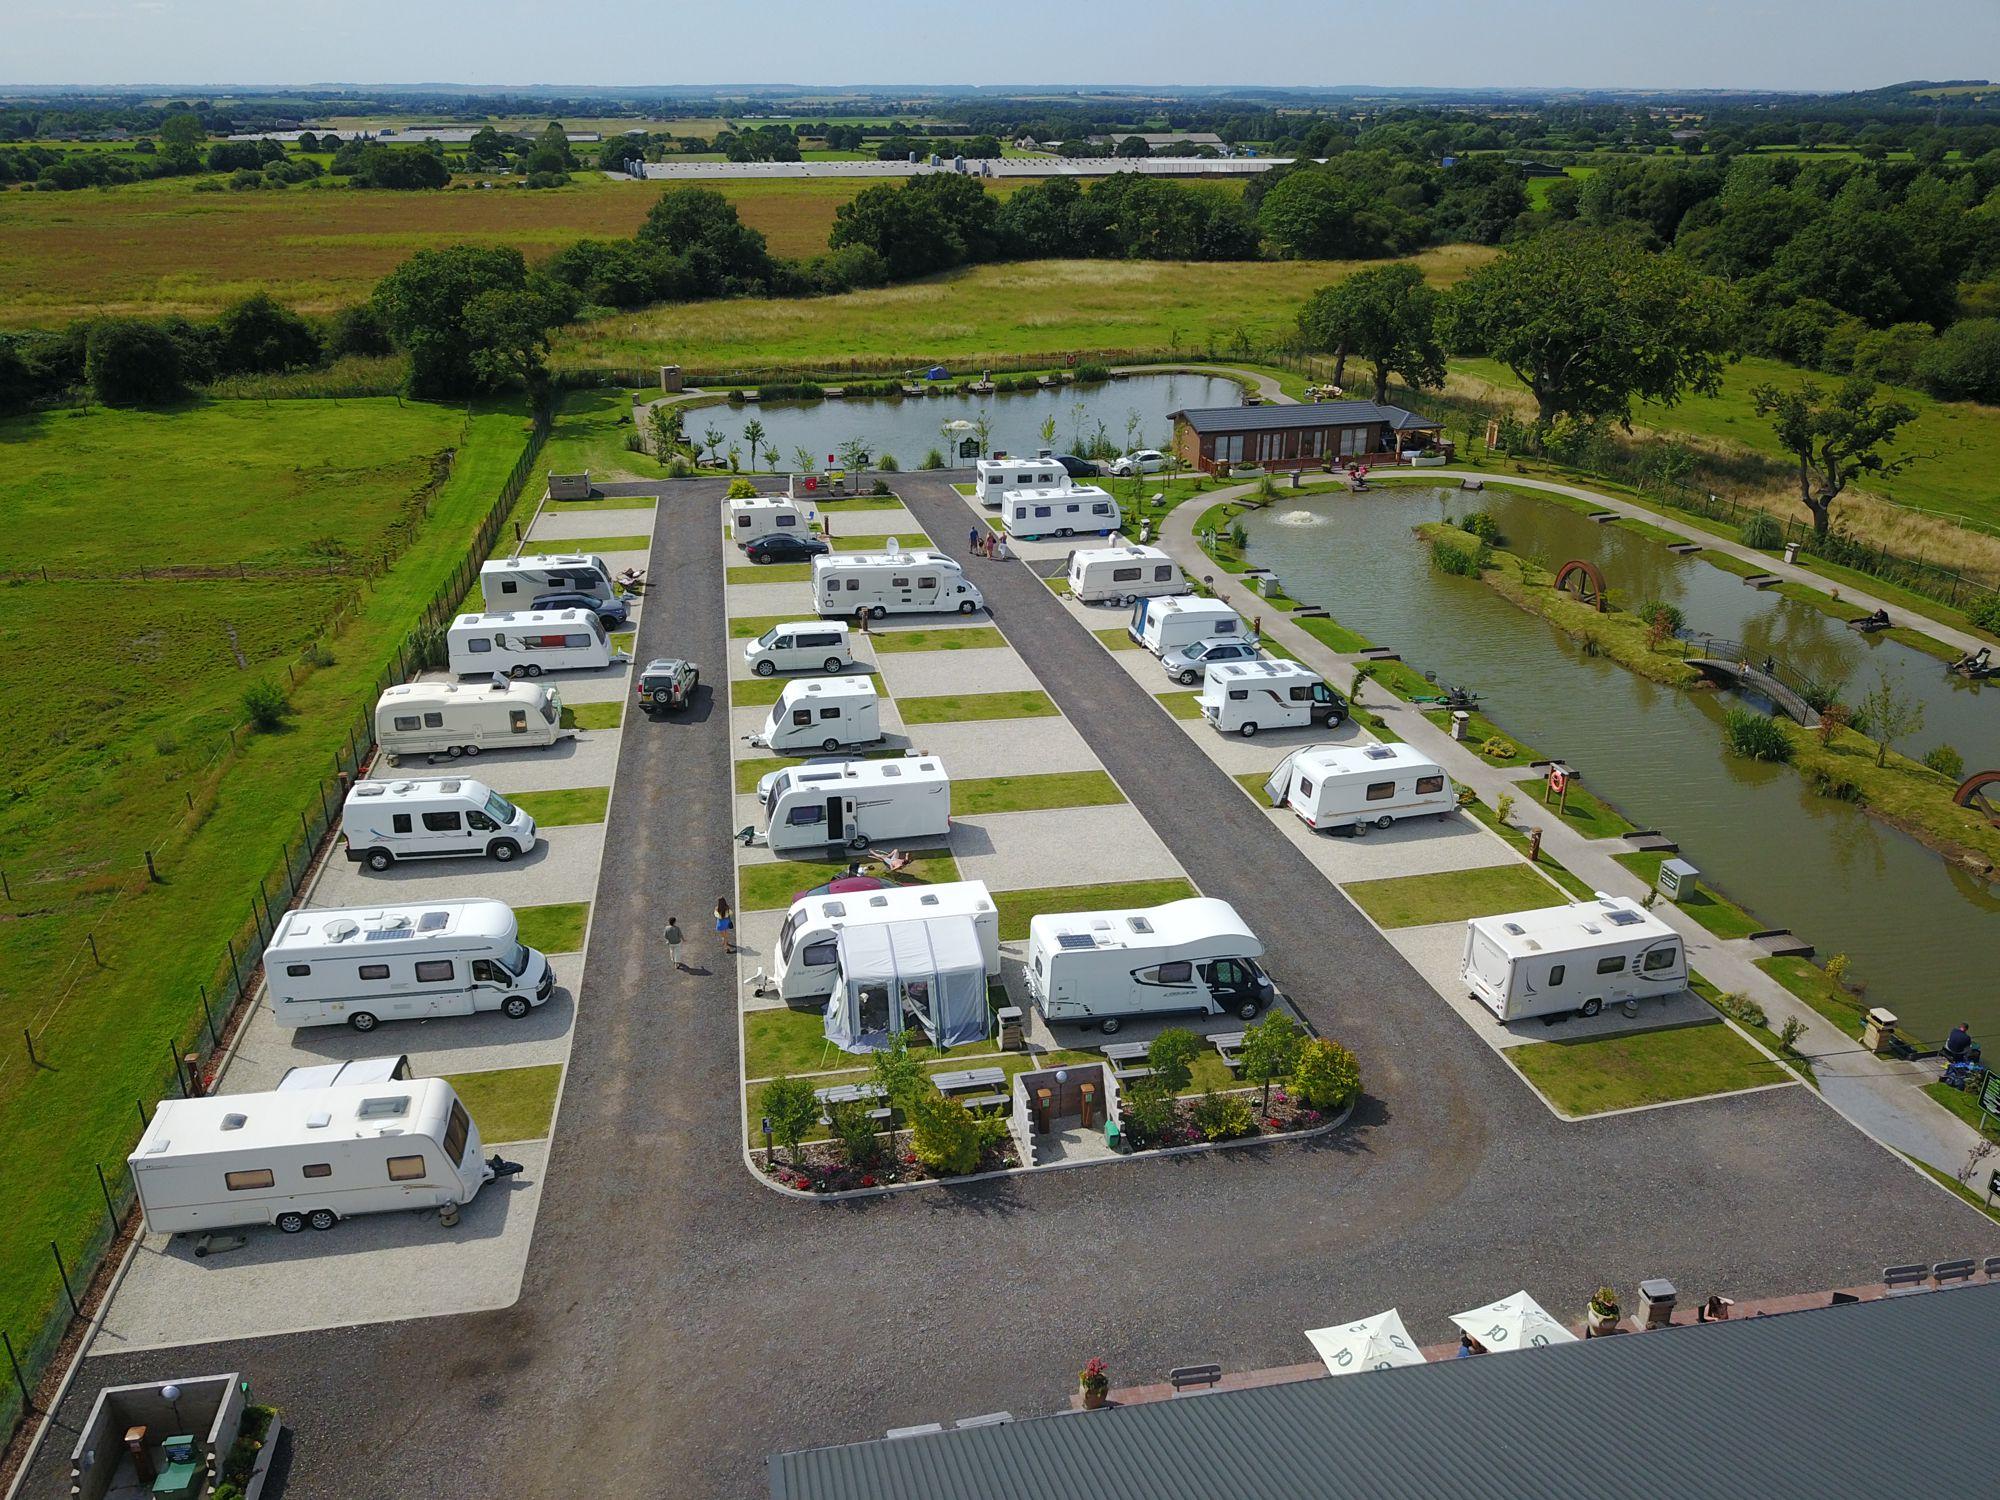 Caravan Parks in UK – I Love This Campsite